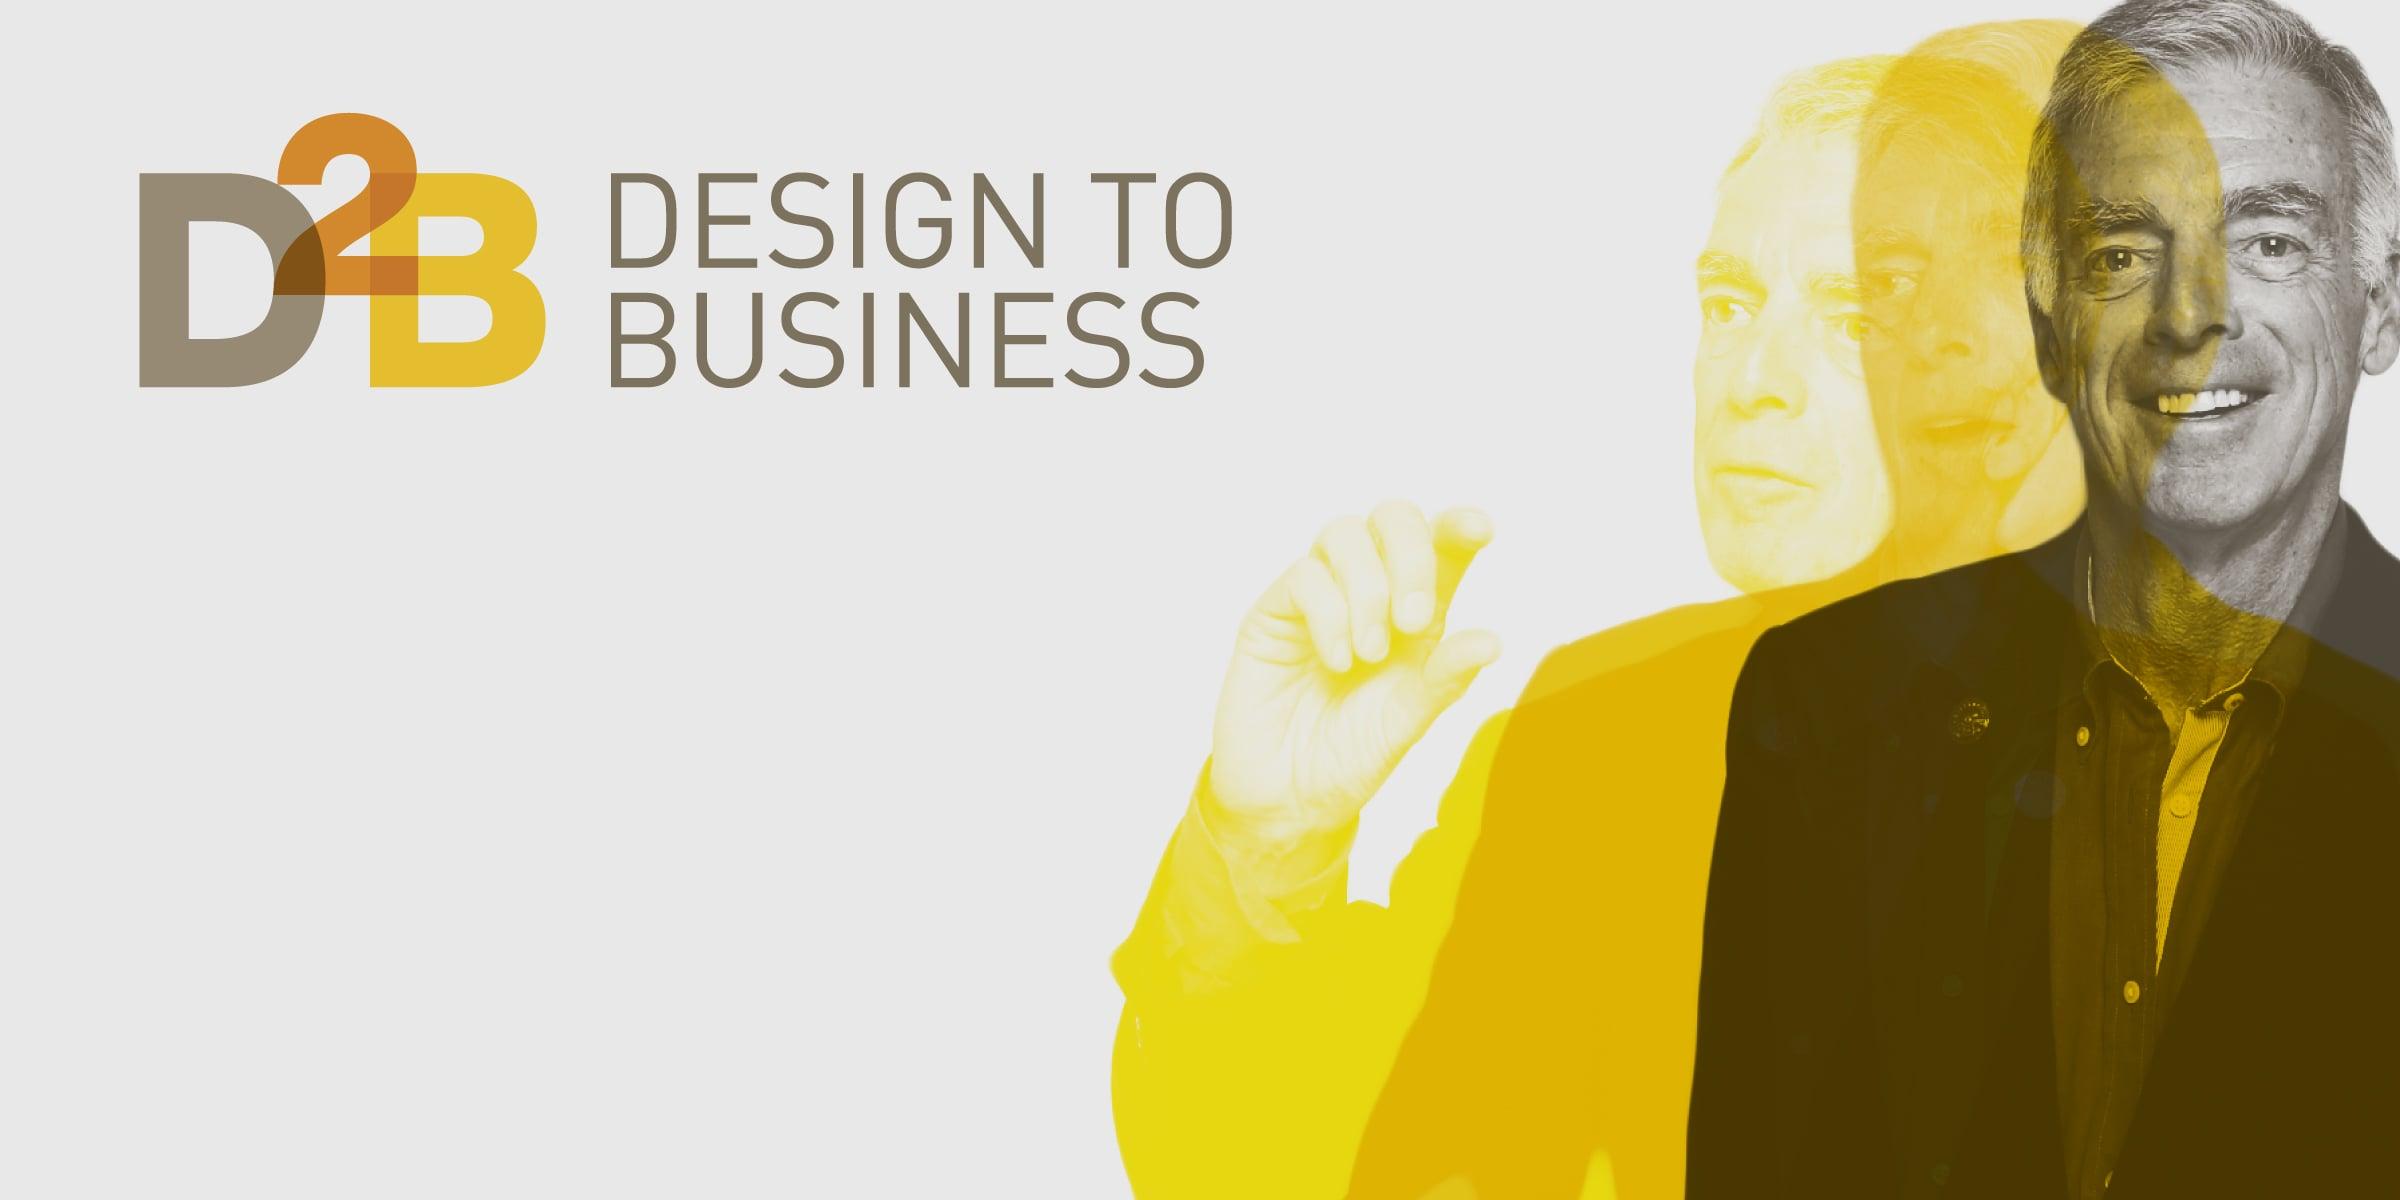 Davidson Branding Digital D2B Design to Business Consultants Logo Visual Language Video